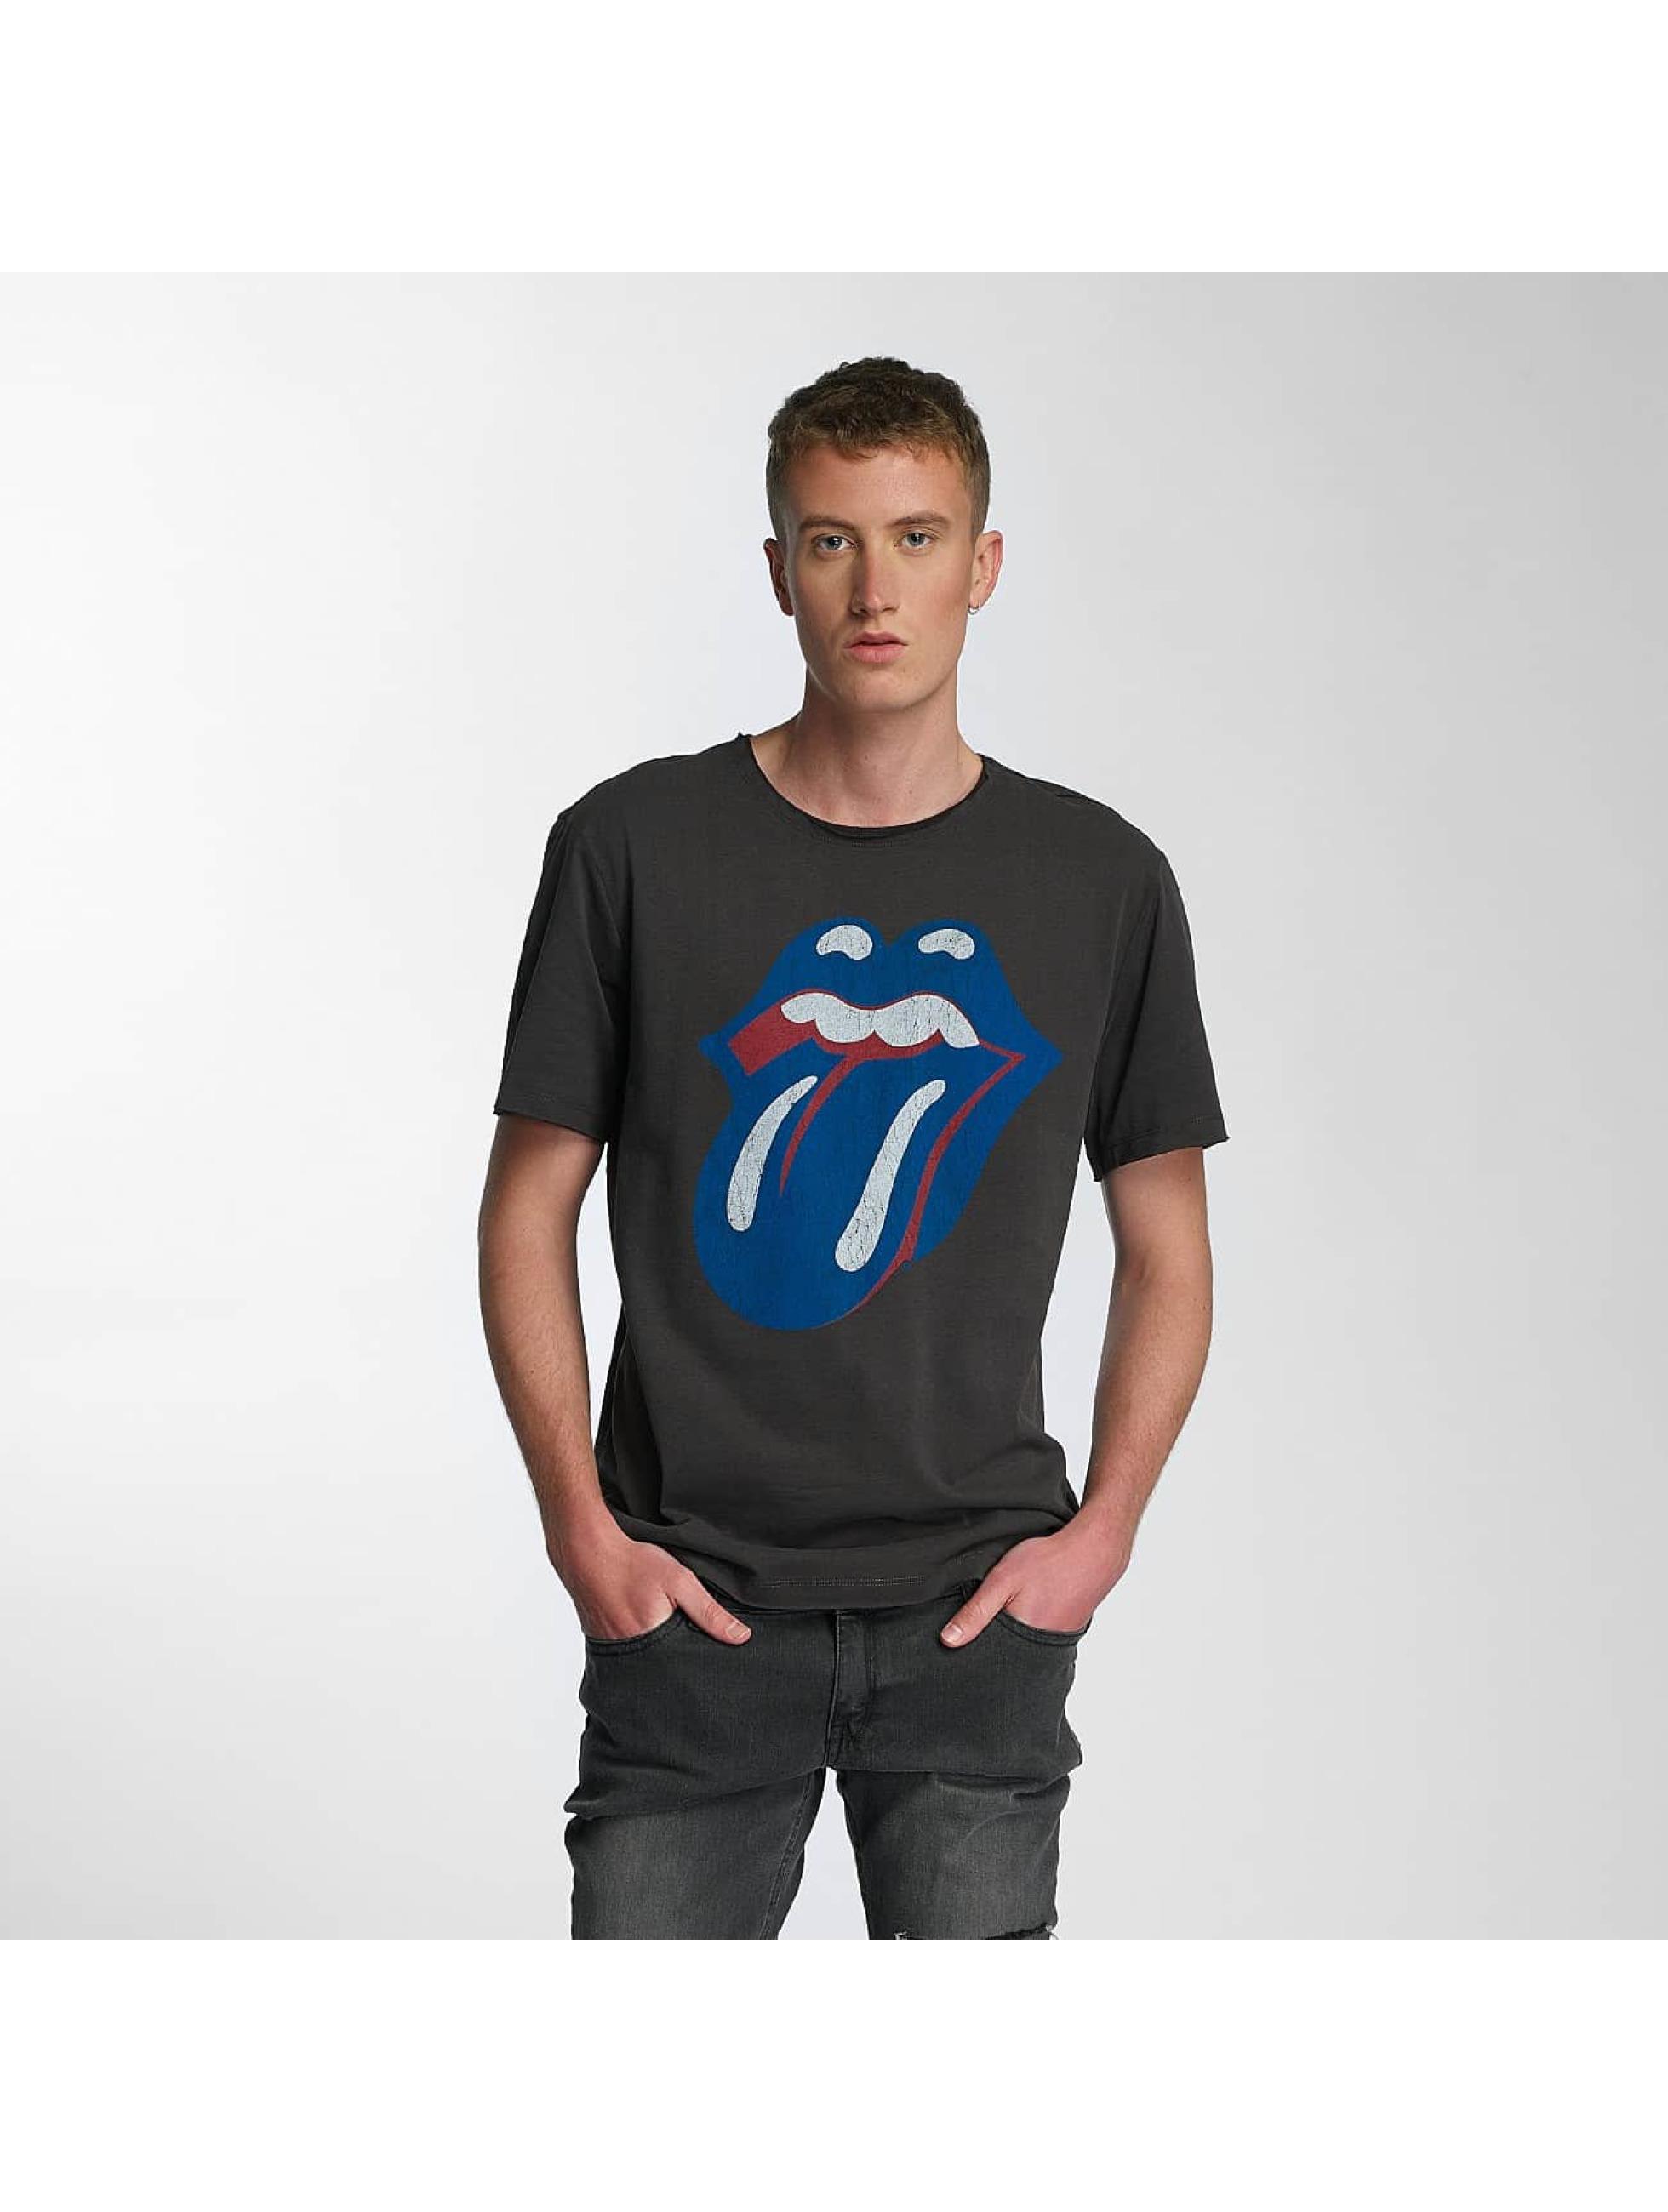 Amplified T-skjorter Rolling Stones Blue und Lonesome grå